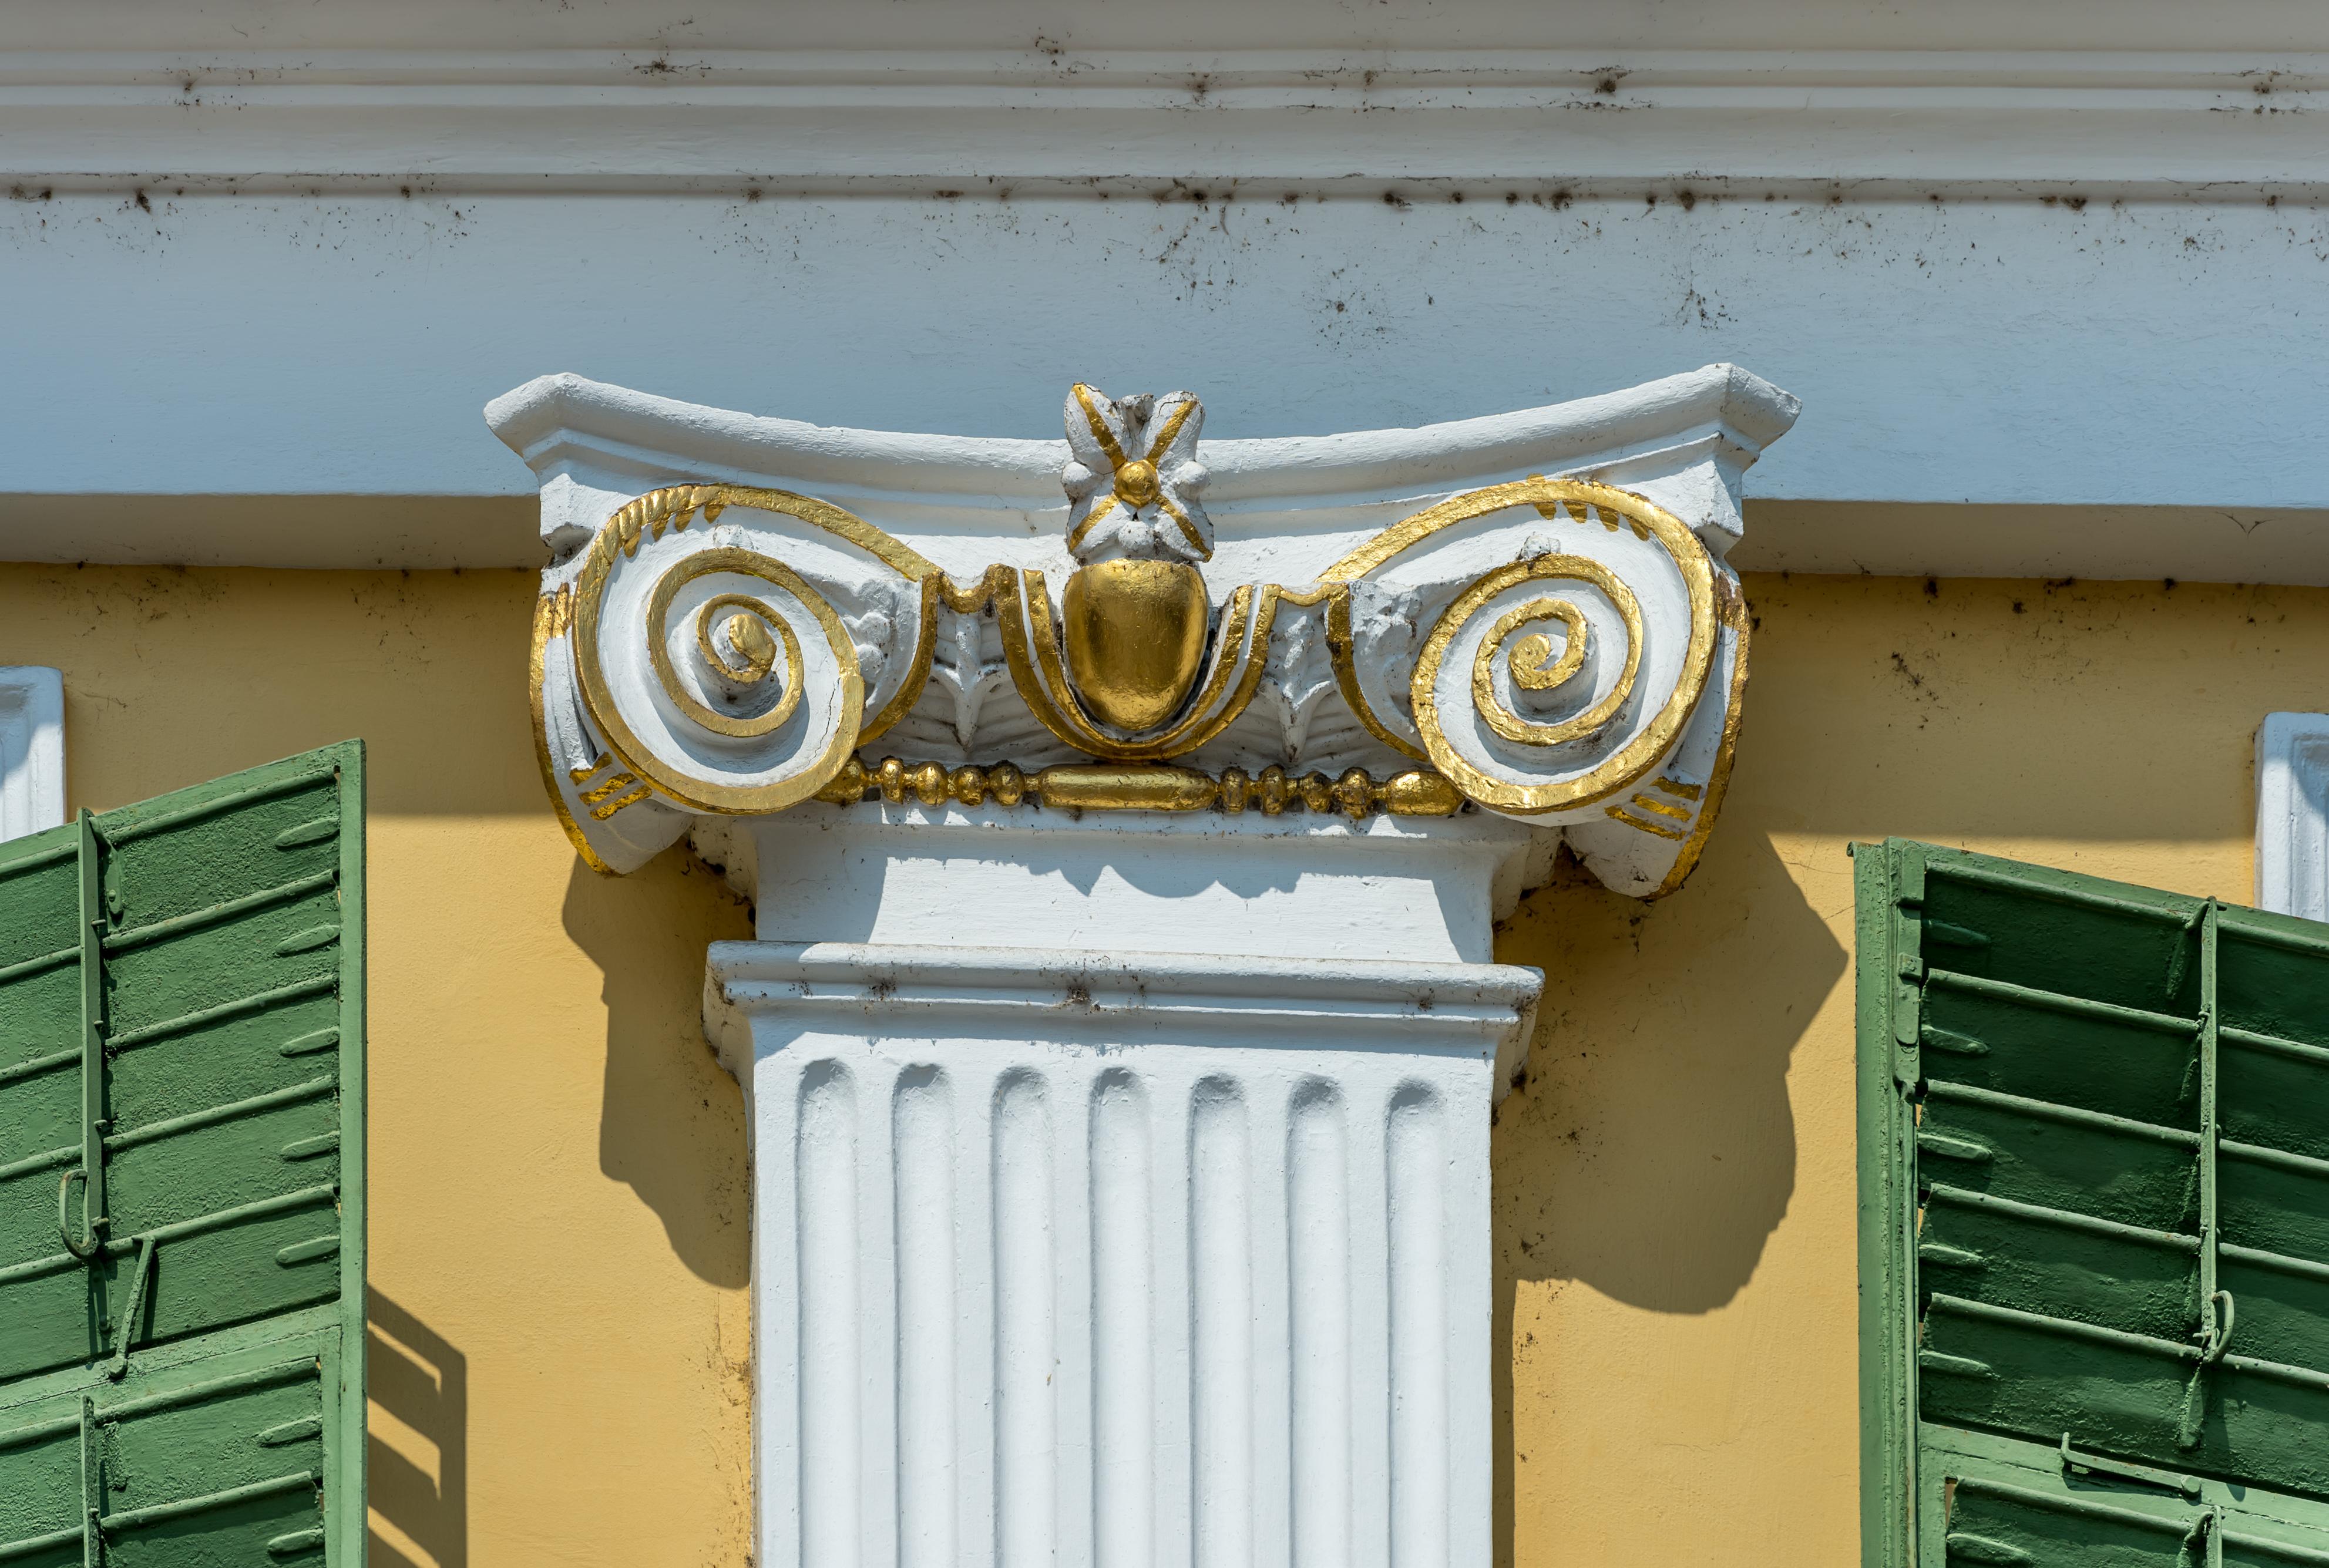 Großartig Fassade Haus Beste Wahl File:feldkirchen Kirchgasse 8 Baur-hansl- Kapitell 02082018 6084.jpg